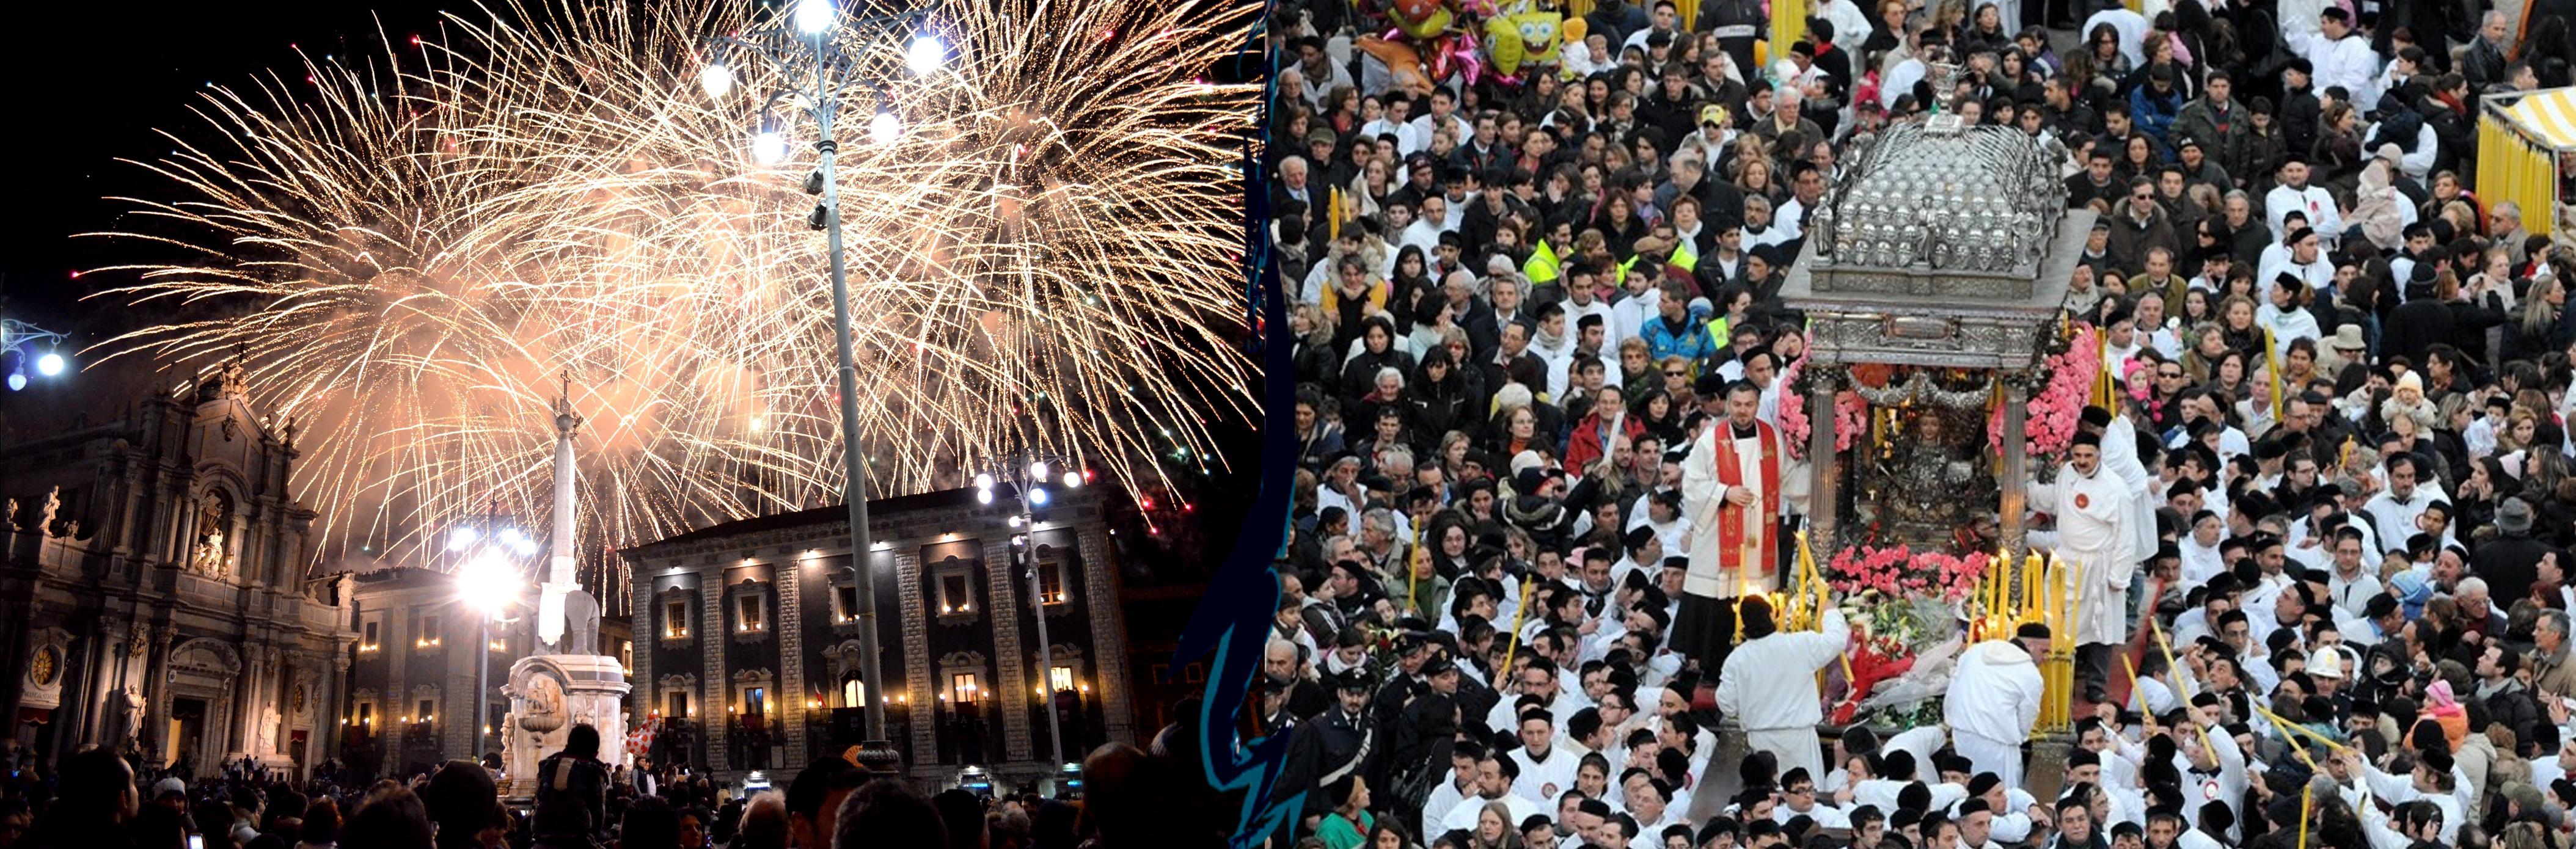 Catania - Festa Sant' Agata